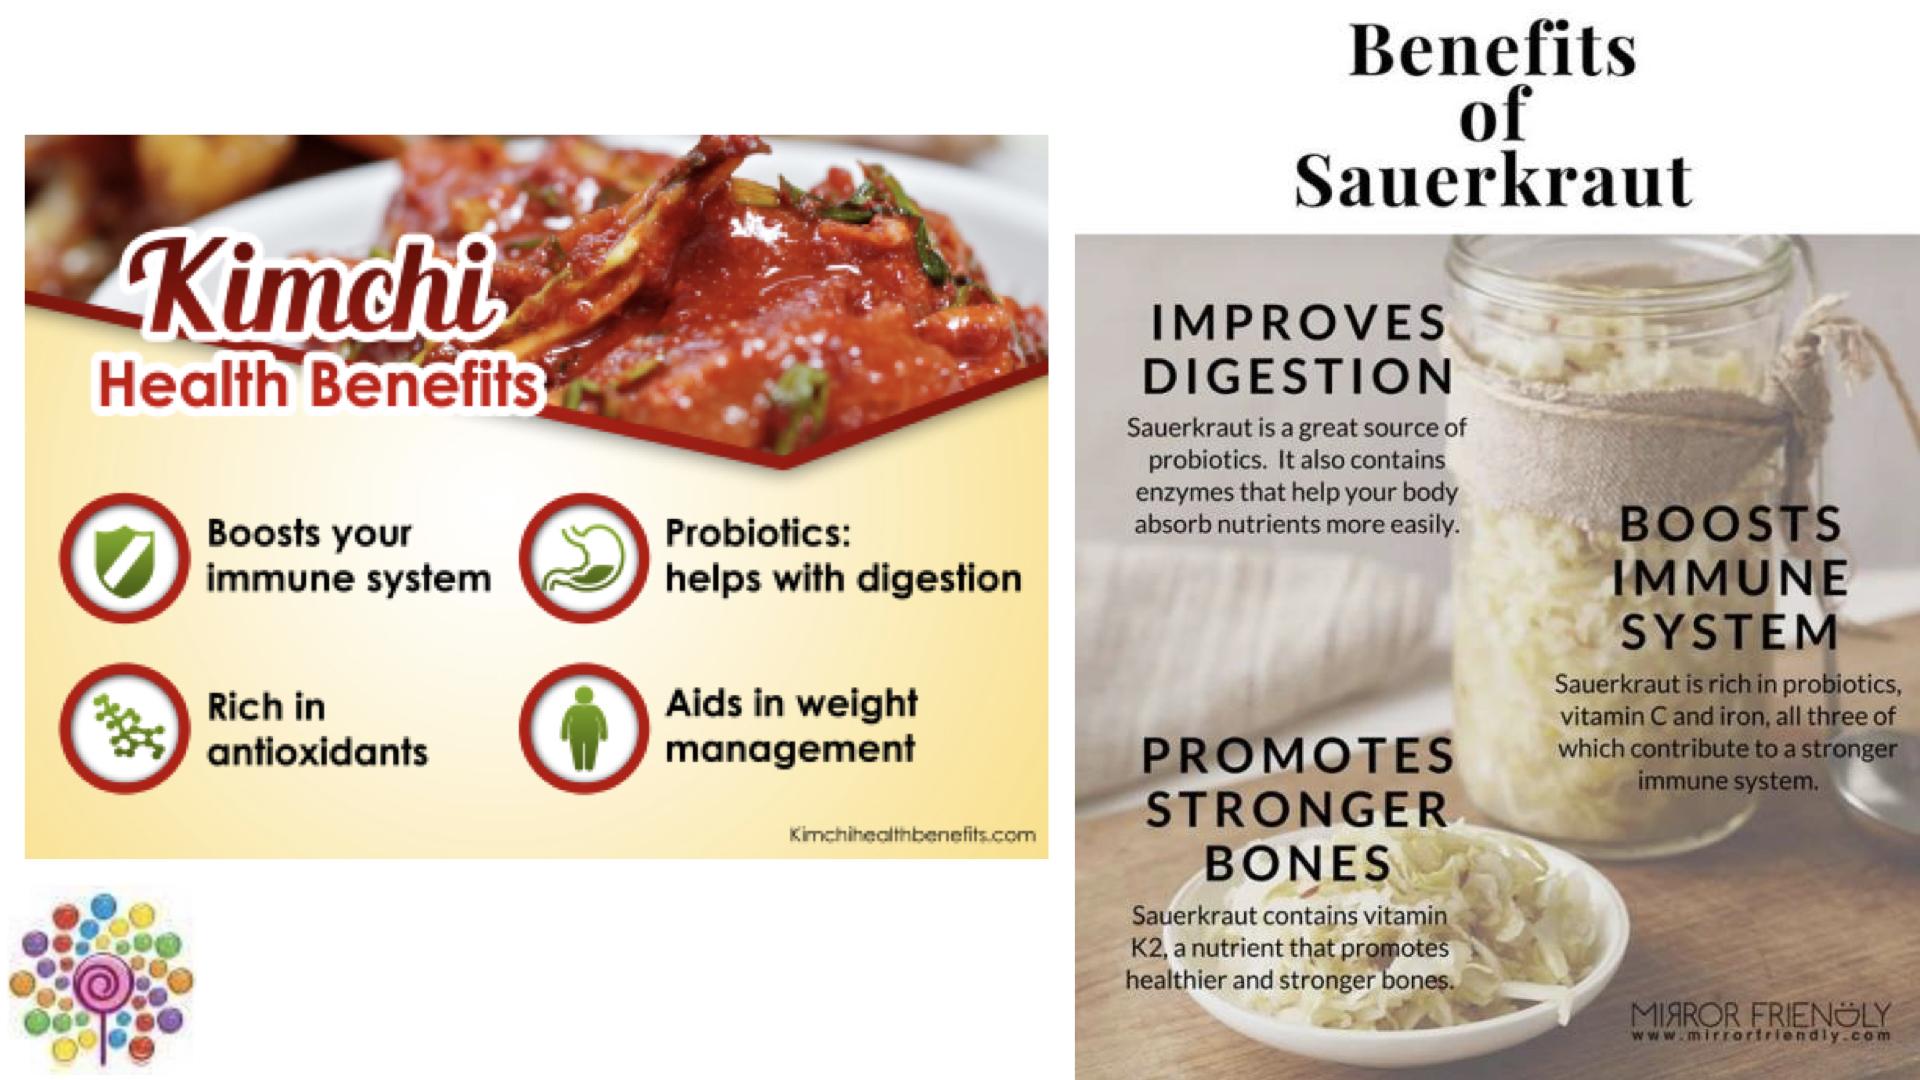 Benefits of kimchi and sauerkraut consumption.